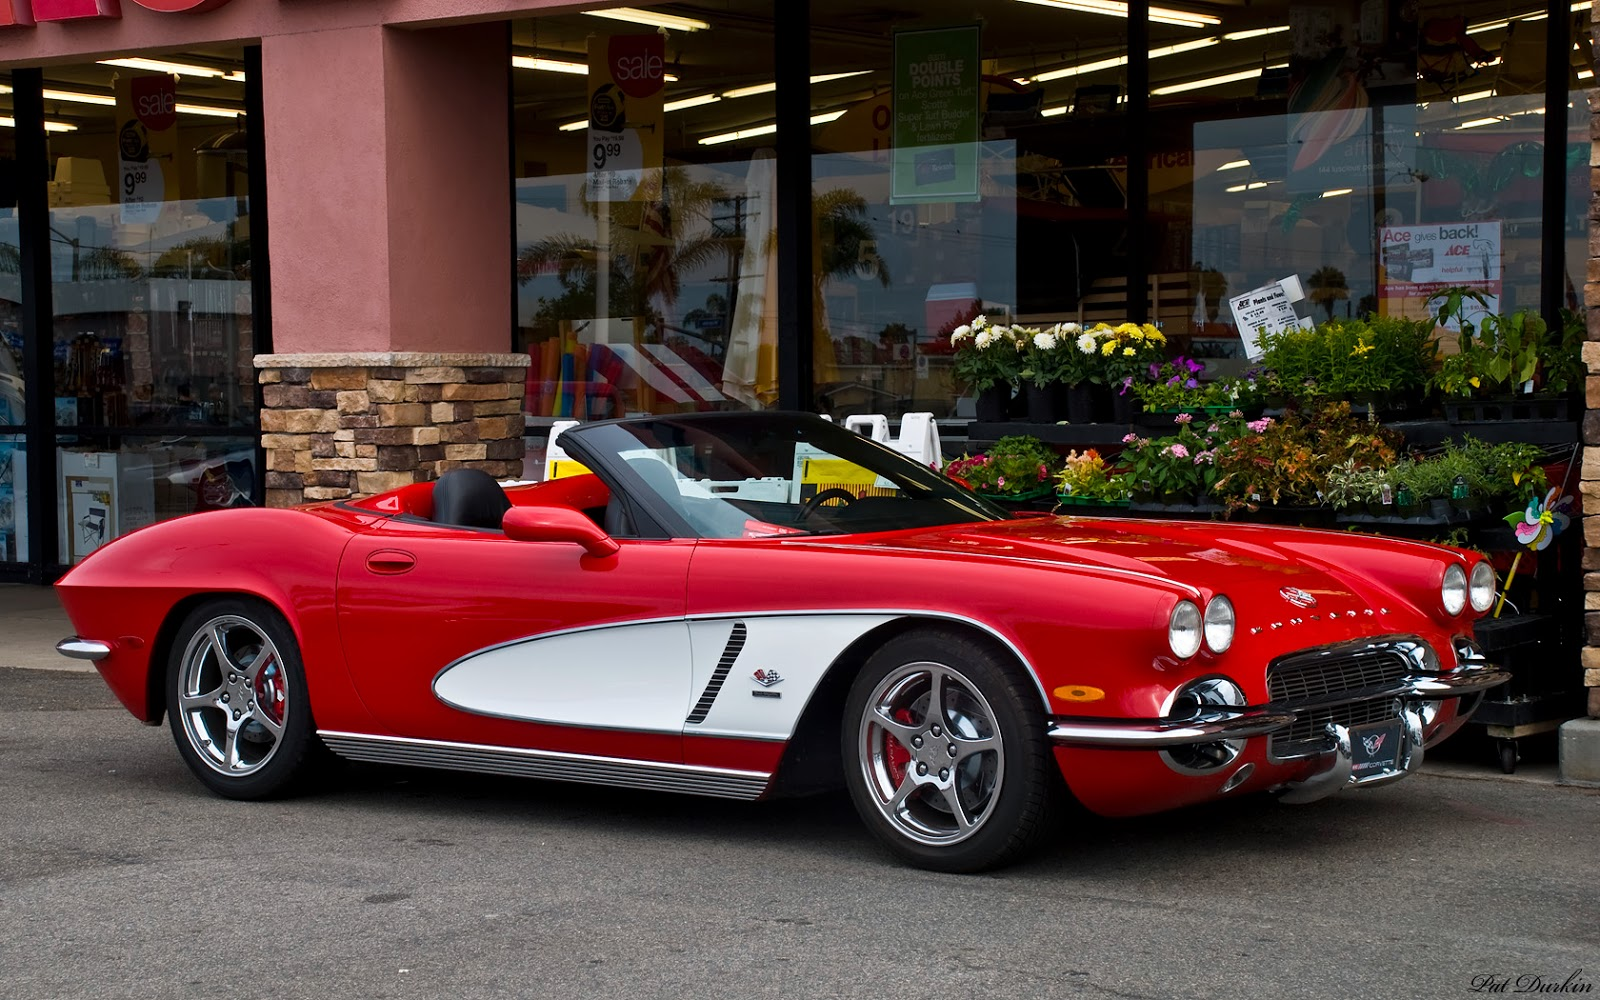 Ferrari Ft Lauderdale >> Urban Pontifficater: Cars Cars Cars @ Thee Dollhouse in Fort Lauderdale ! Gas Monkey Garage ...